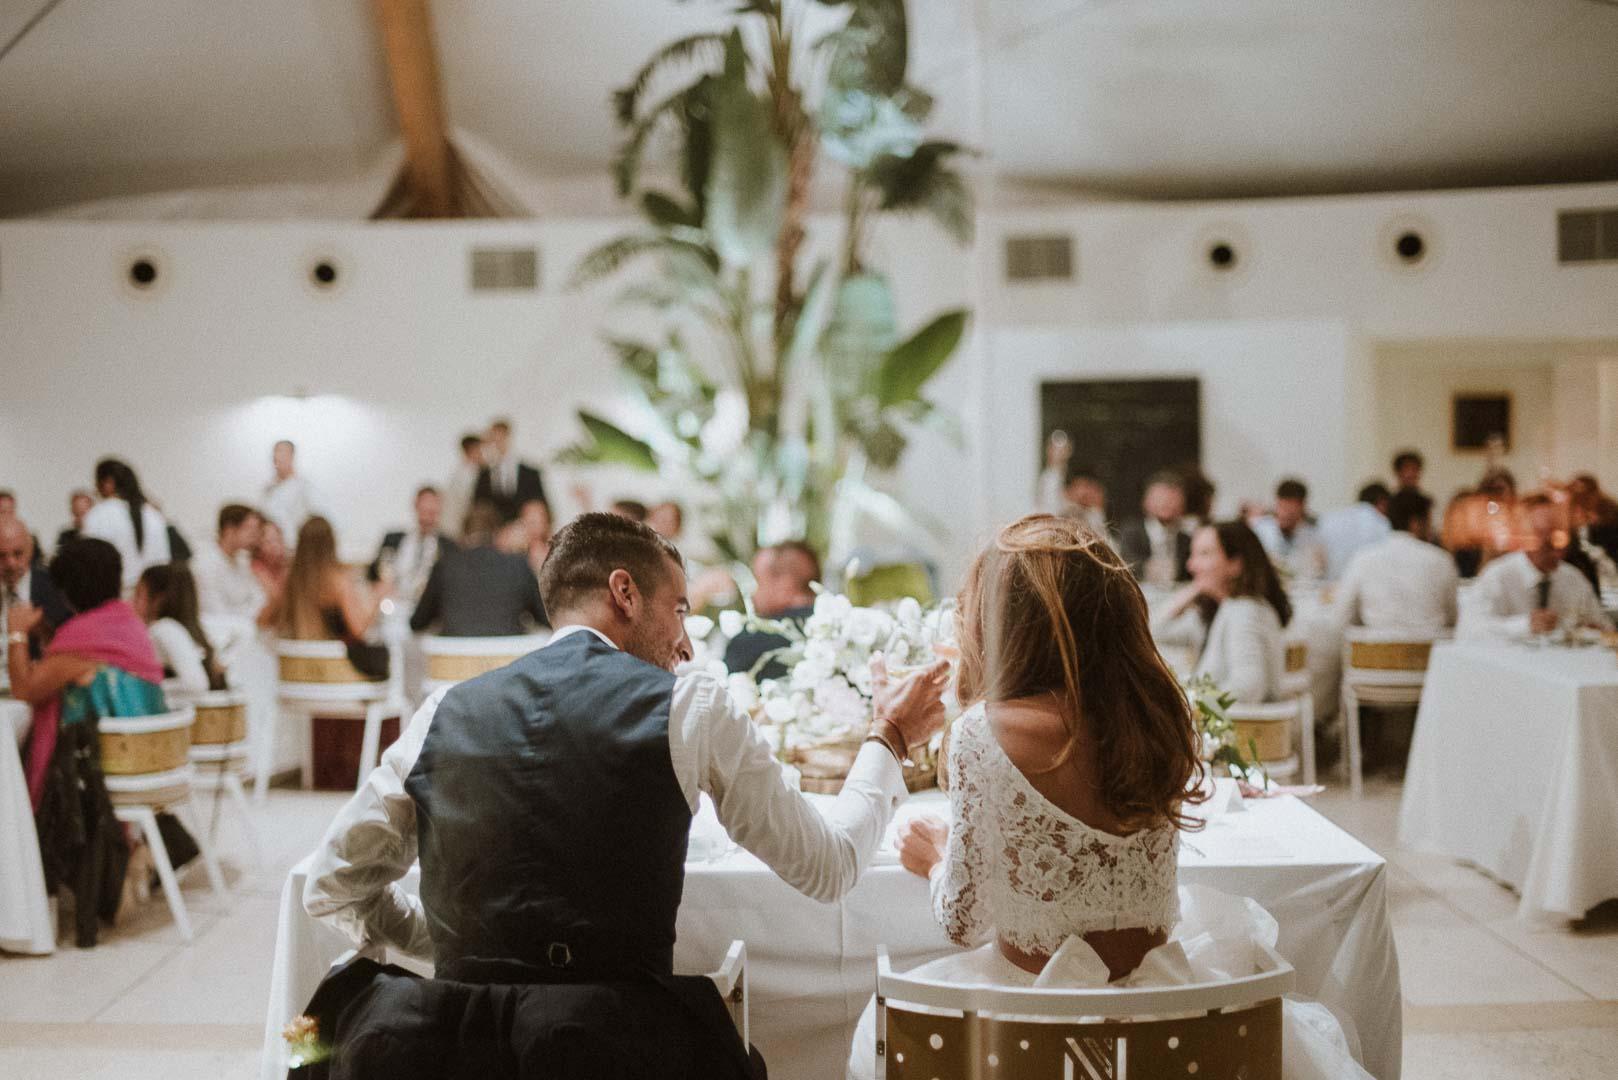 wedding-photographer-destination-fineart-bespoke-reportage-napoli-nabilah-vivianeizzo-spazio46-182